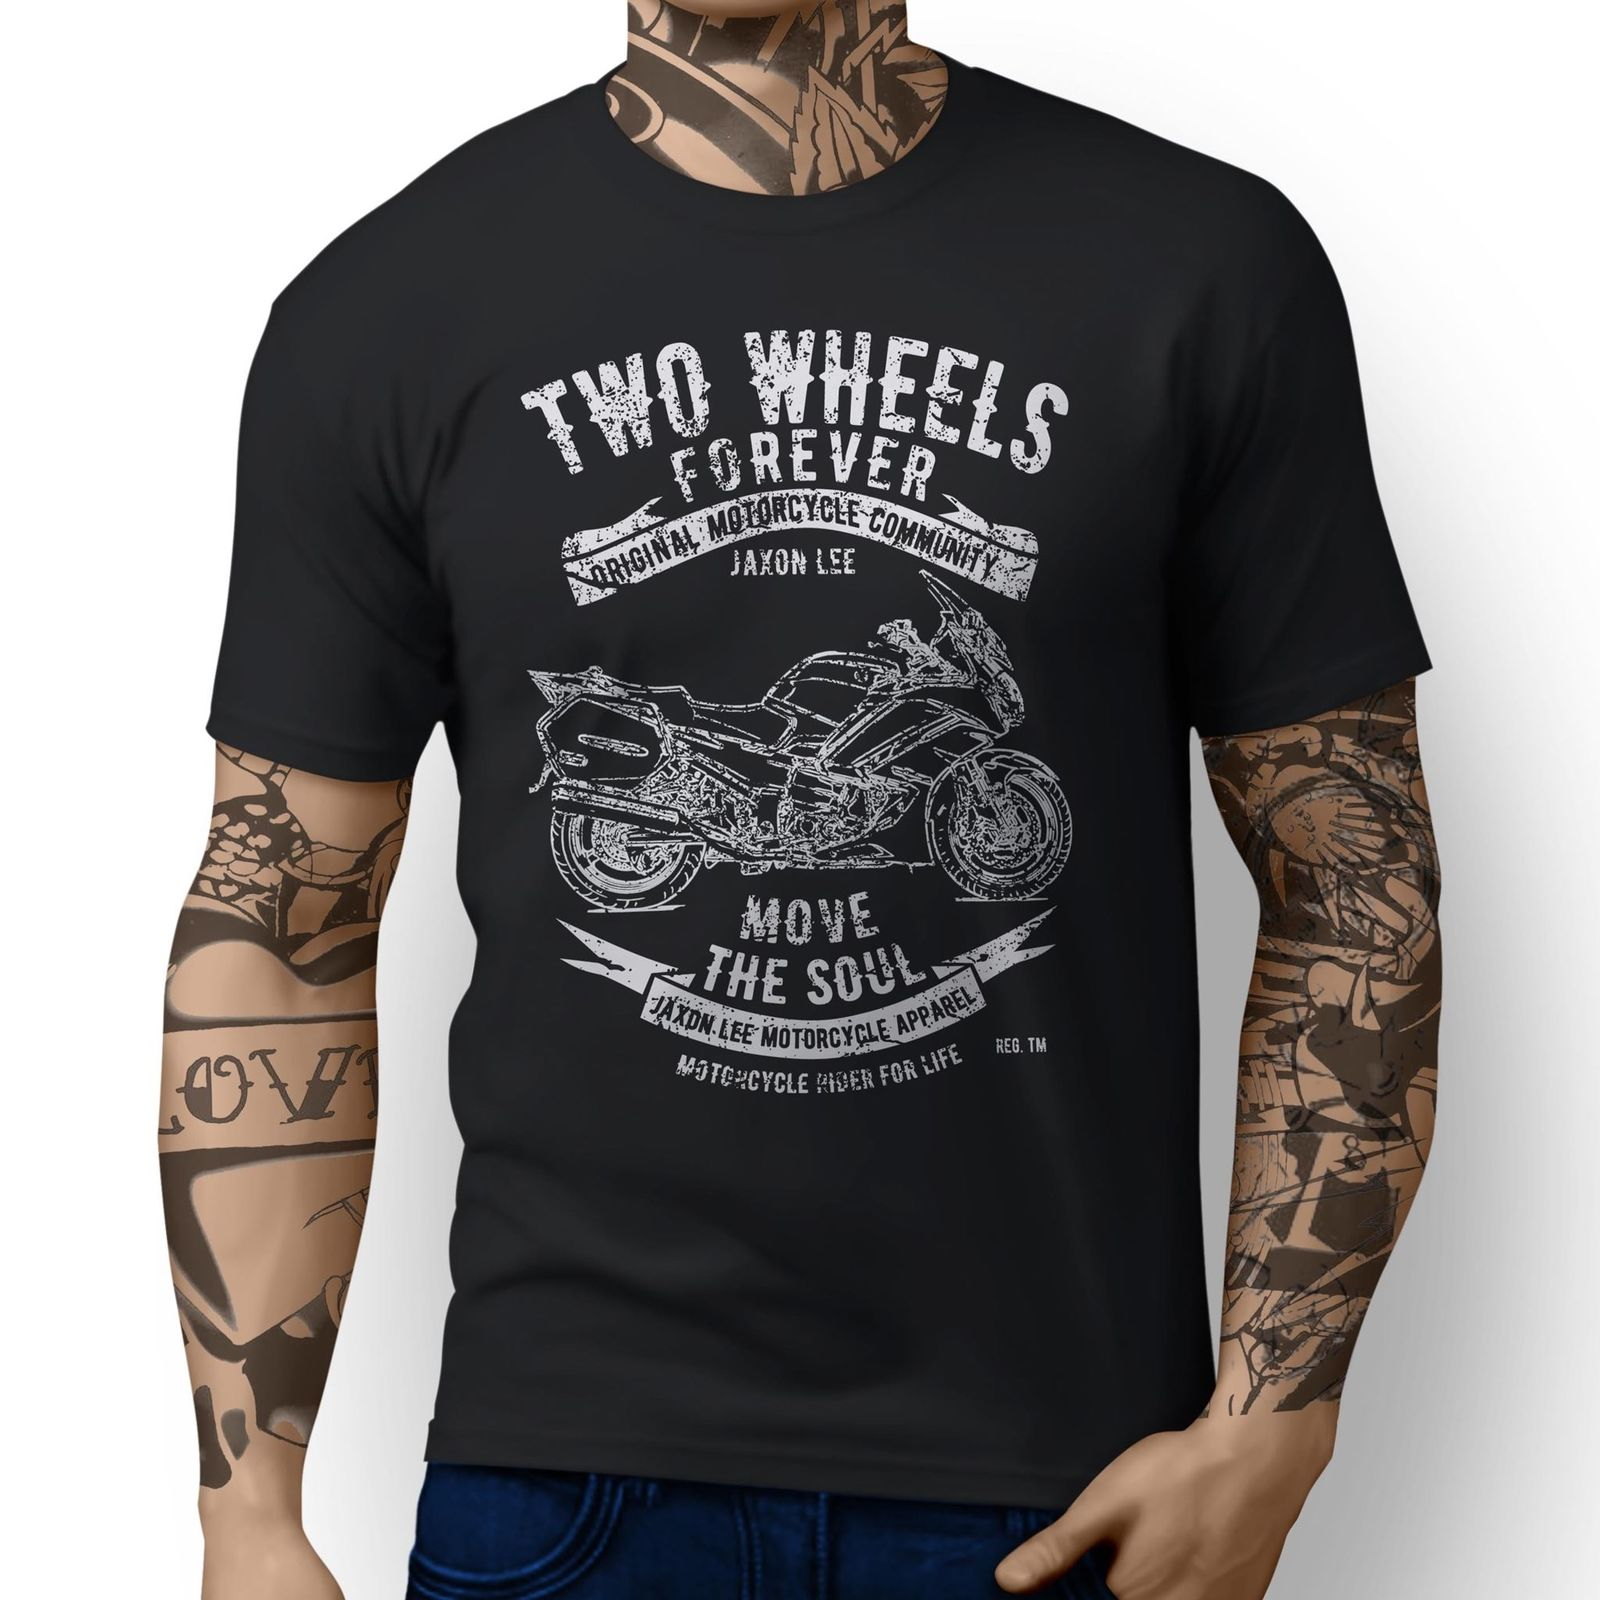 a095f089ee 2019 New Men T Shirt 100% Cotton Print Shirts Japanese Classic Motorbike  FJR1300 v2 inspired Motorcycle Art design T-shirts